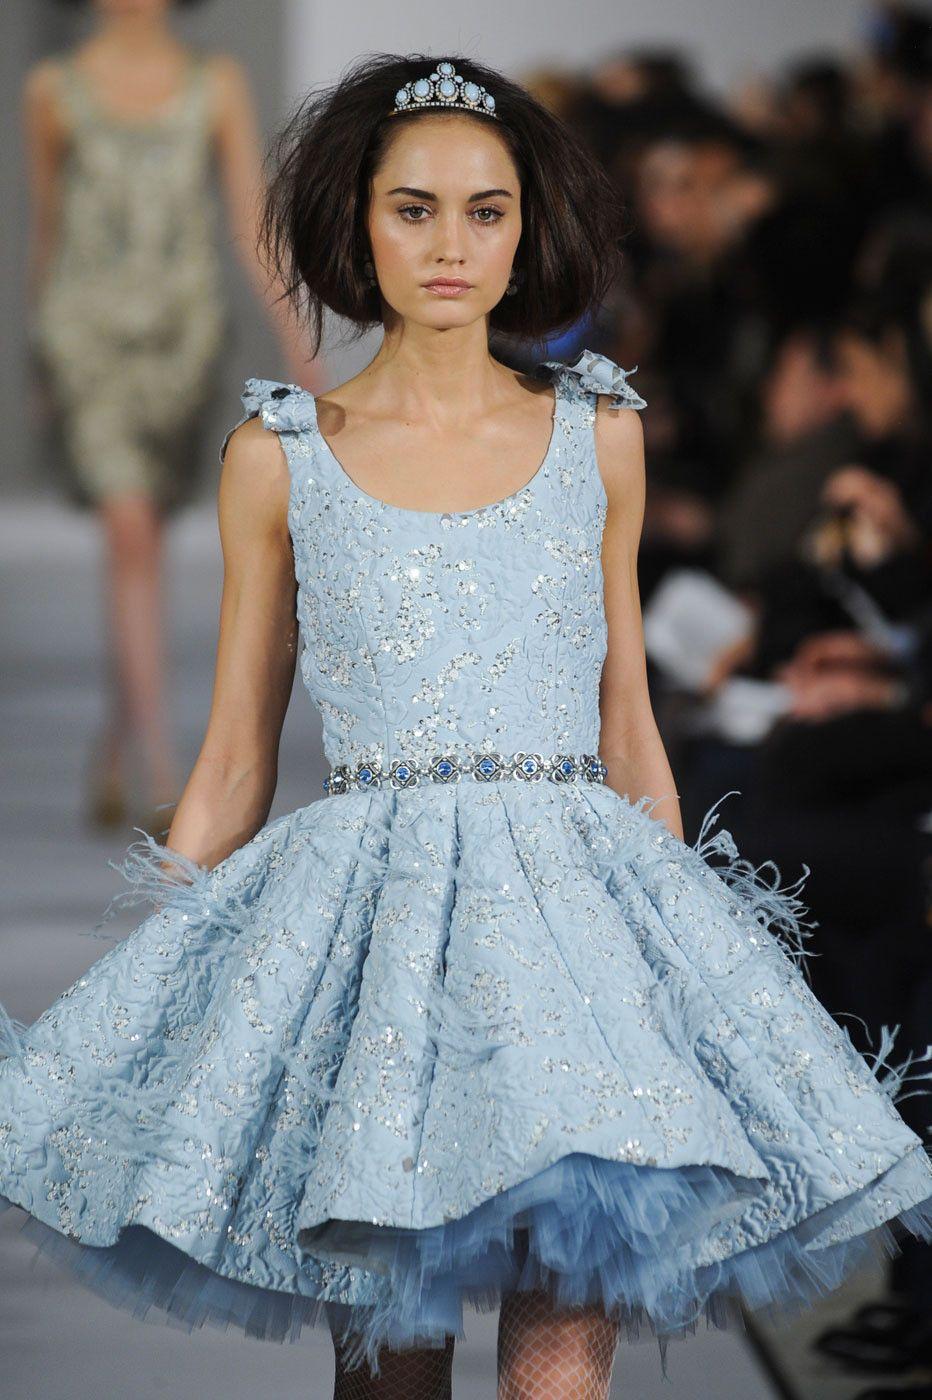 Oscar de la Renta at New York Fashion Week Fall 2012 | Oscar de la ...